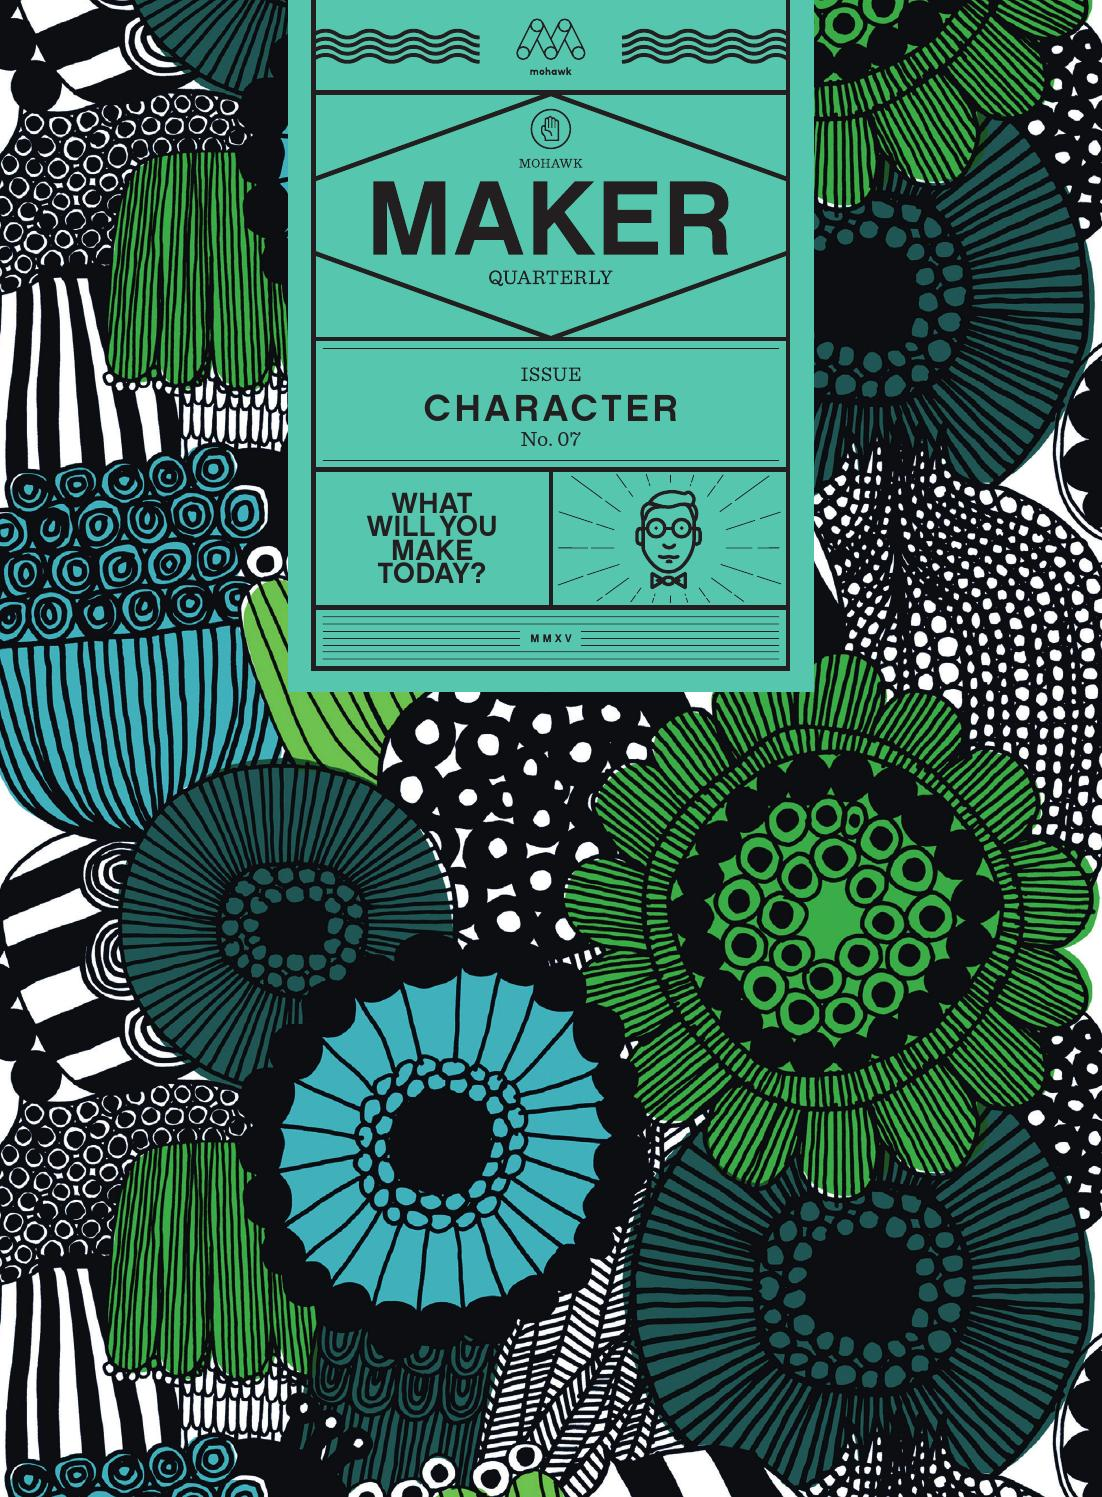 Character Design Quarterly Issue 3 : Mohawk maker quarterly issue character by issuu